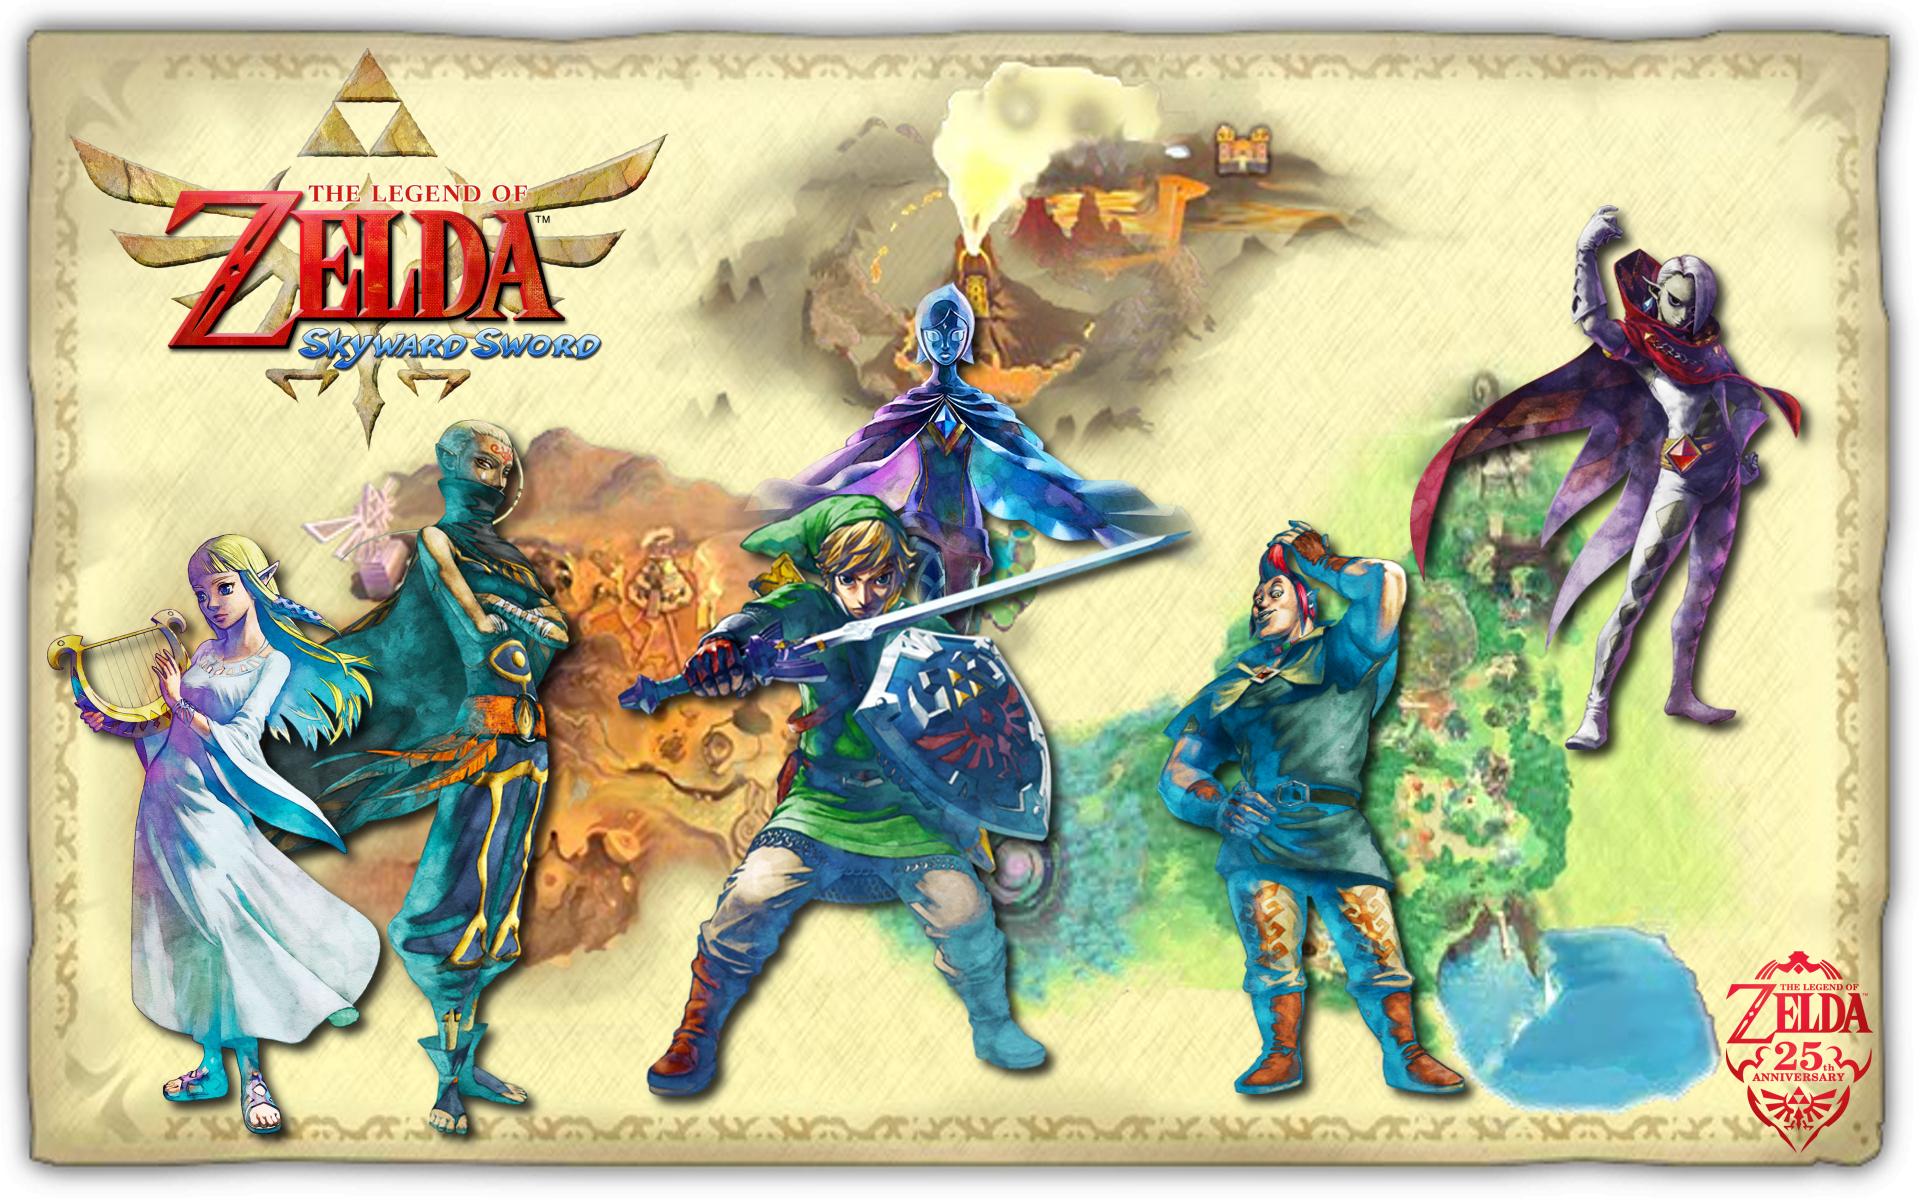 Legend Of Zelda Skyward Sword Wallpaper Remake By